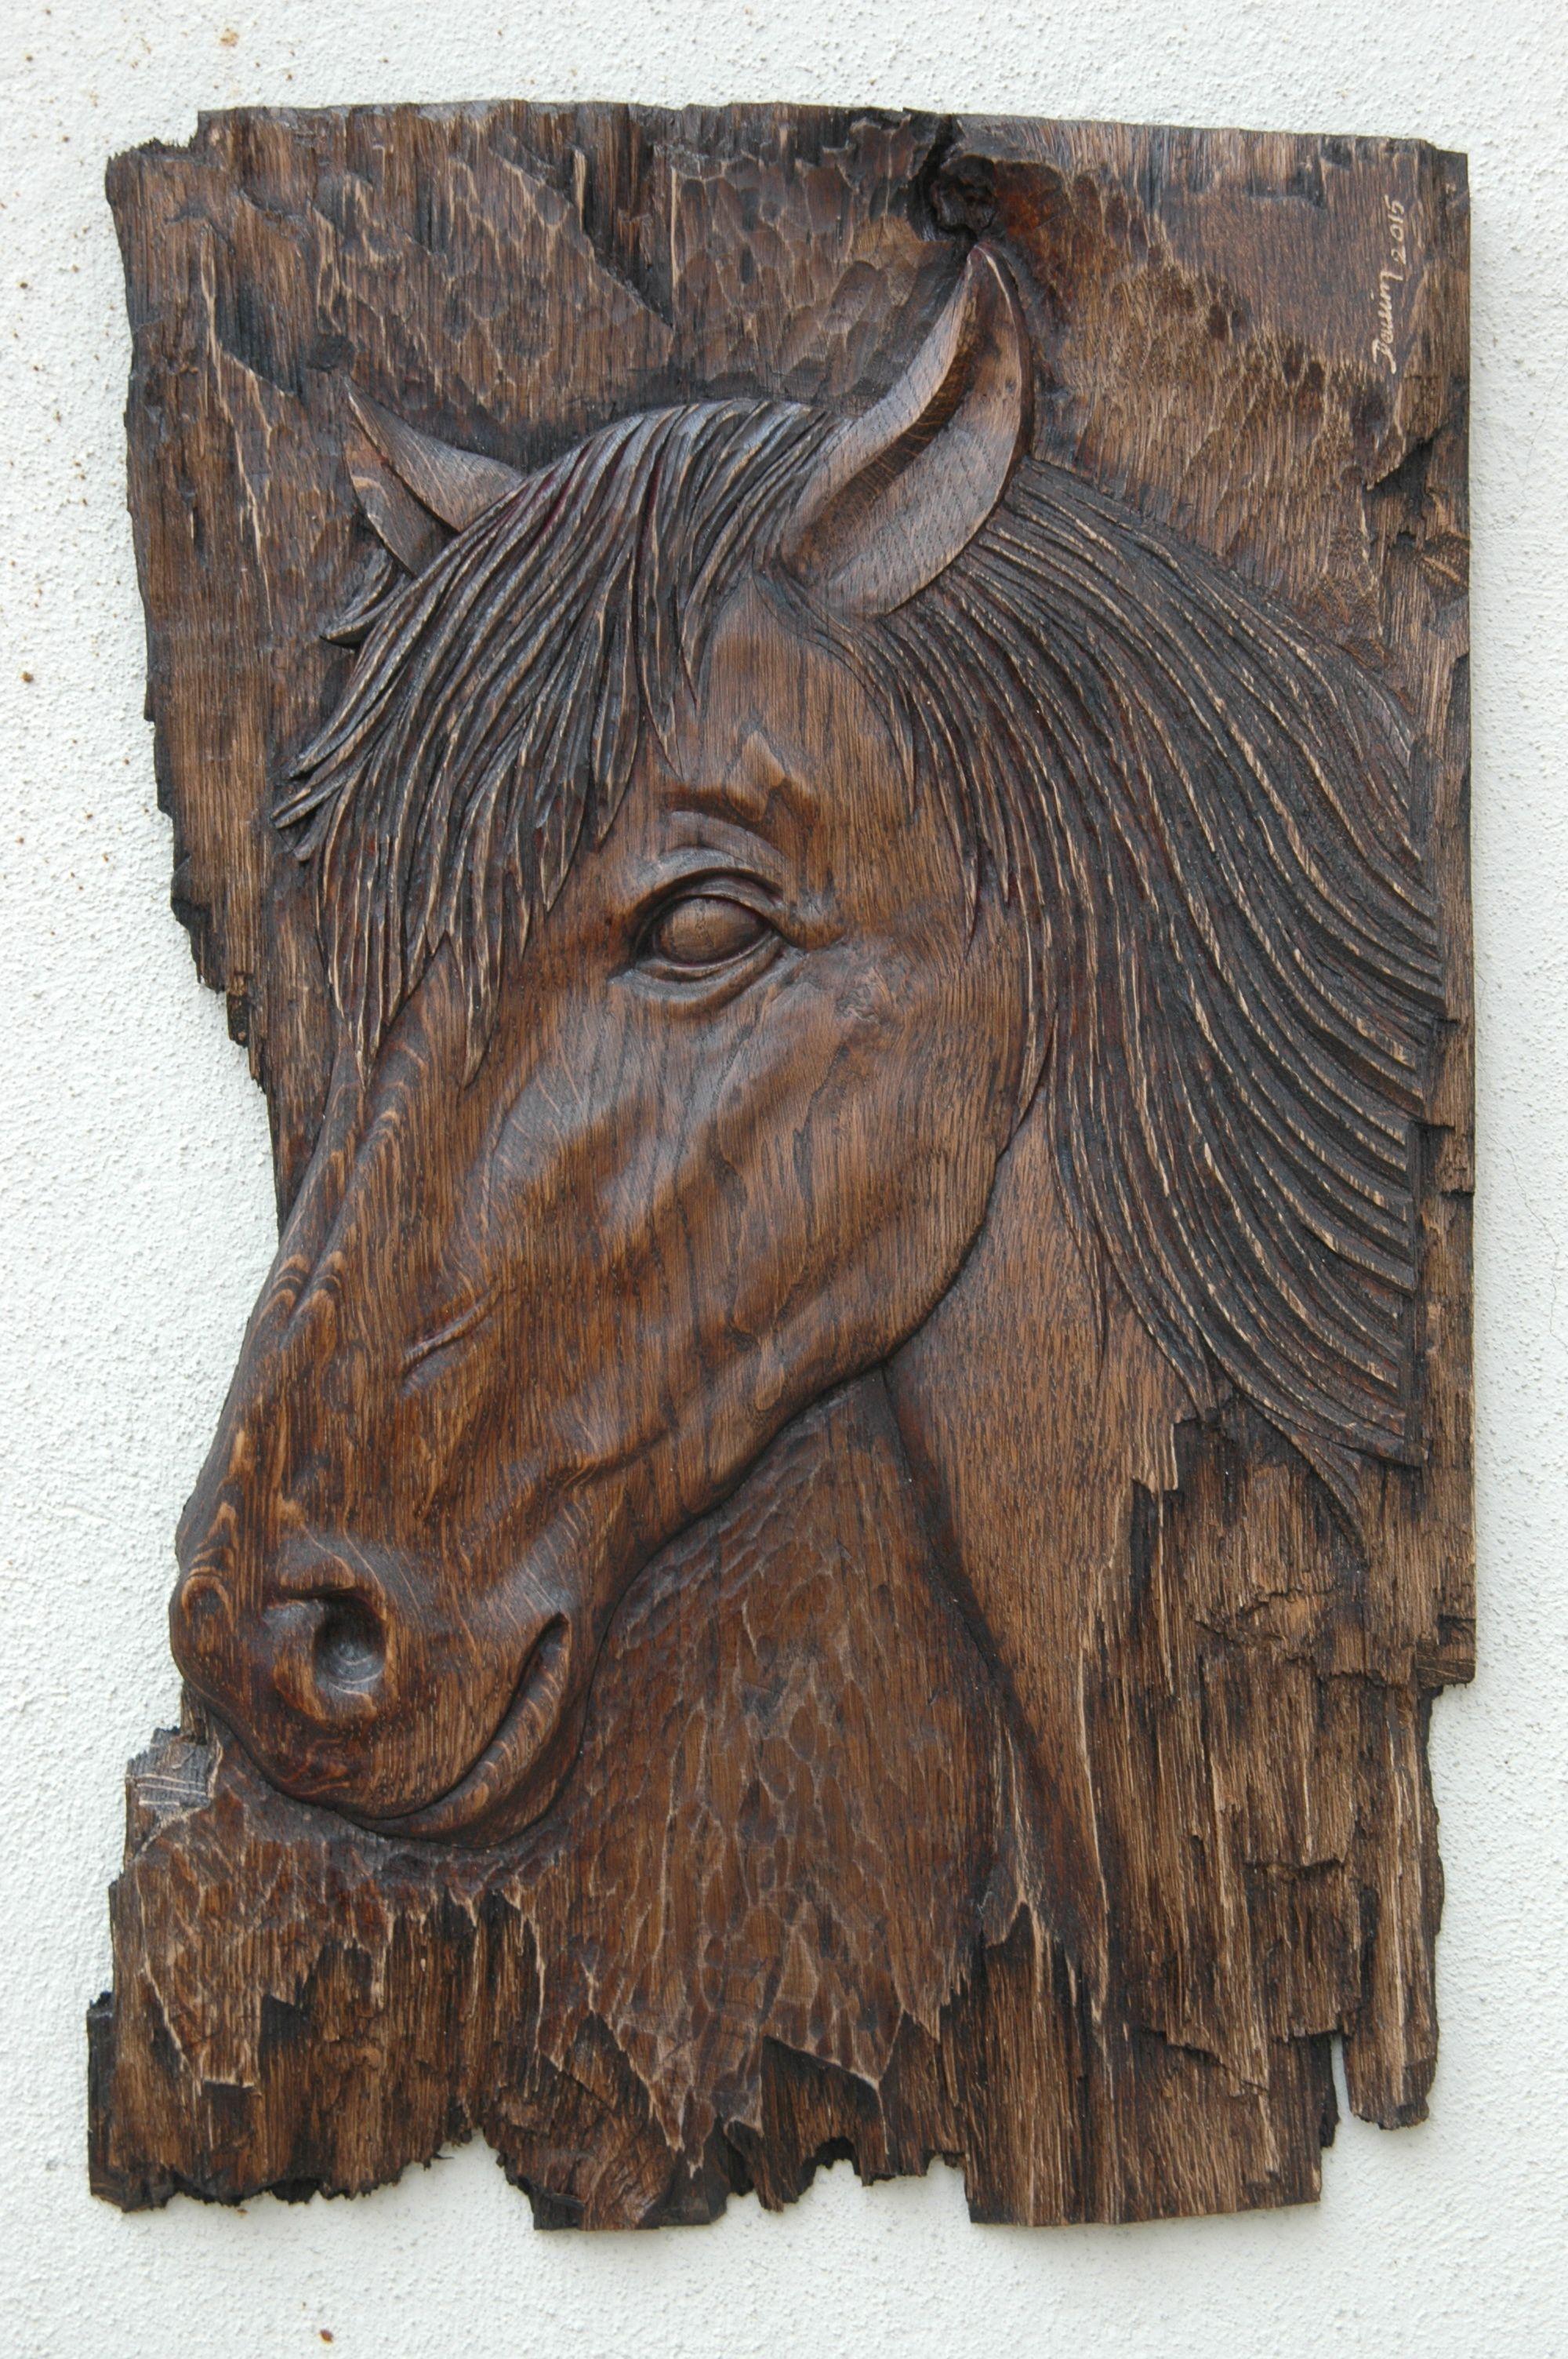 Relief horse wood carving ahşap oyma devrİm erakalin